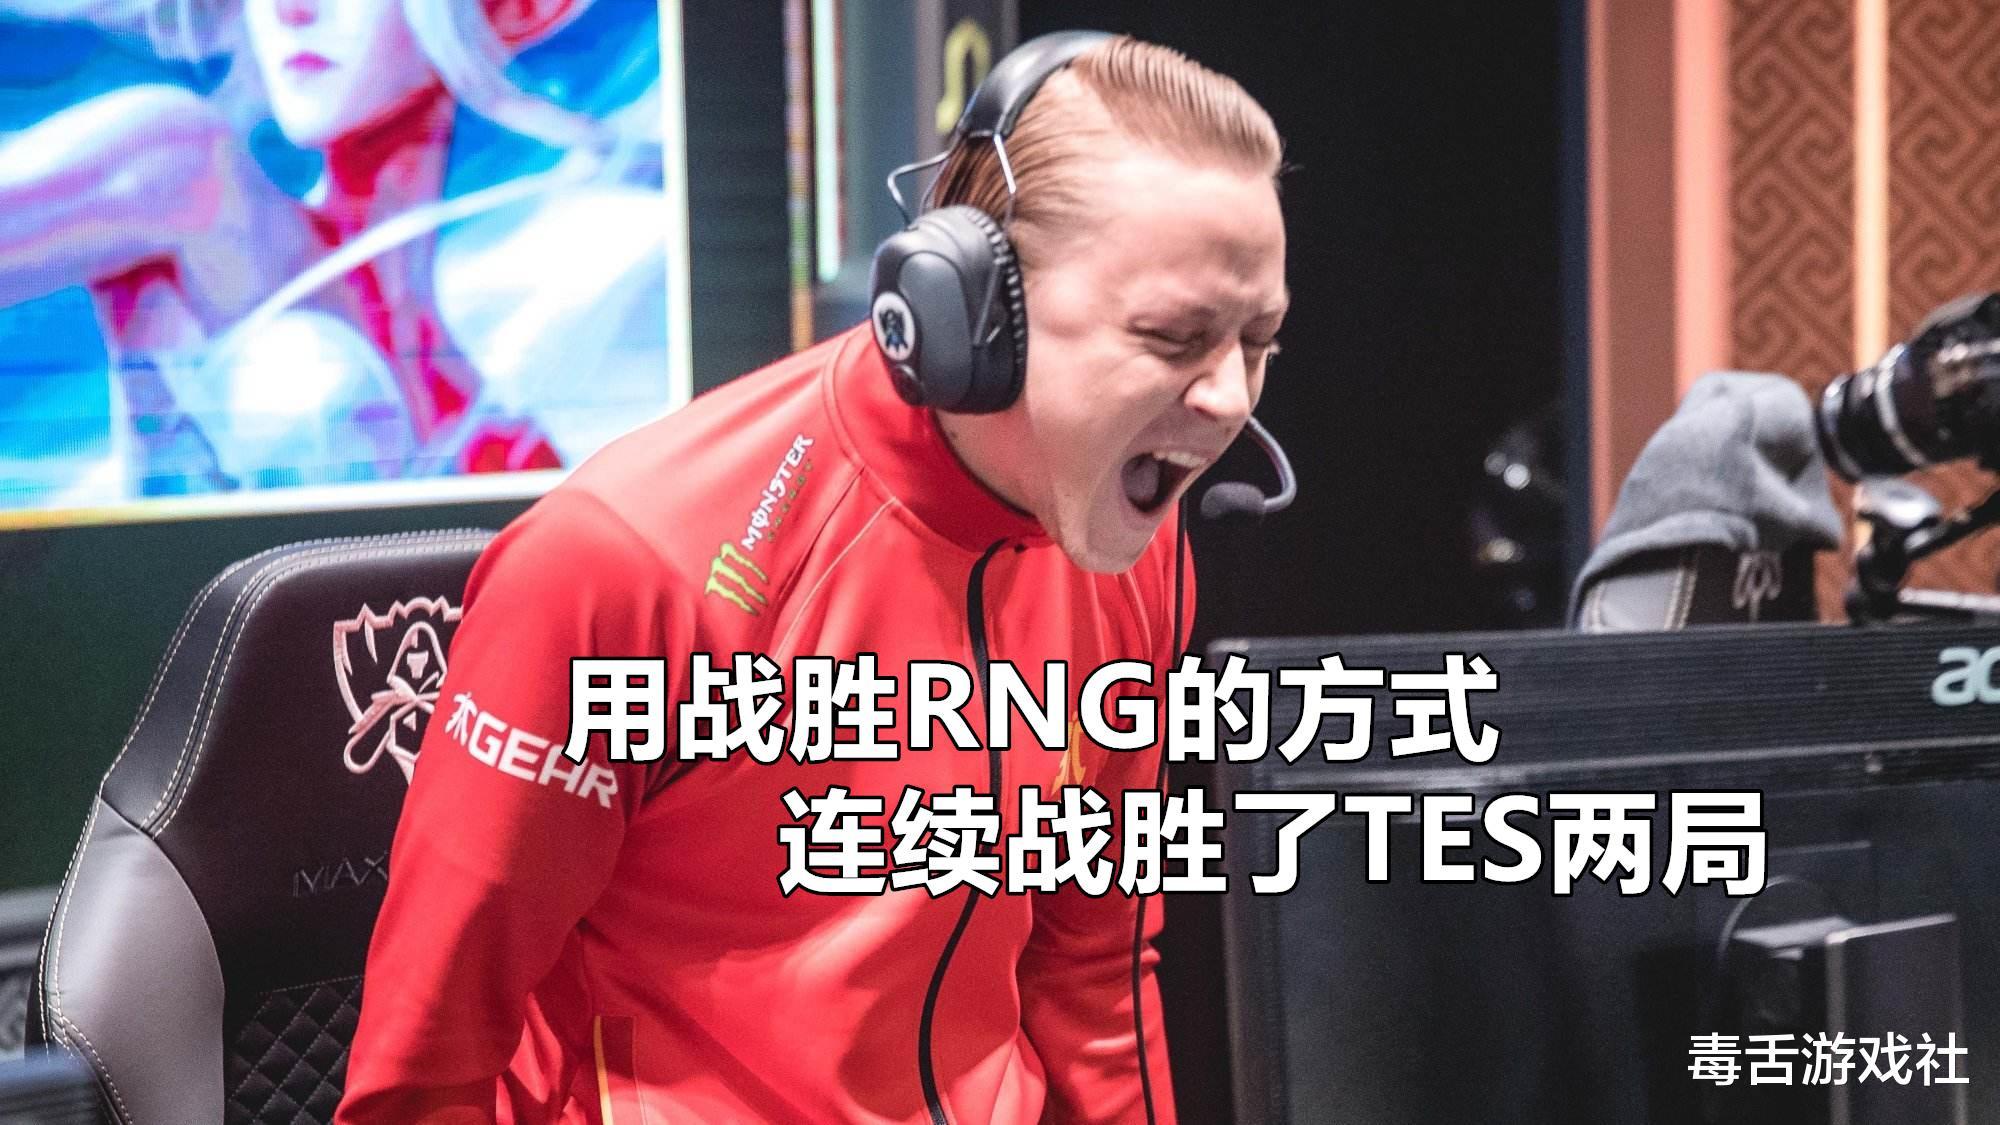 FNC用战胜RNG的方式,赢了TES两局,但JKL有Uzi没有的东西插图(1)